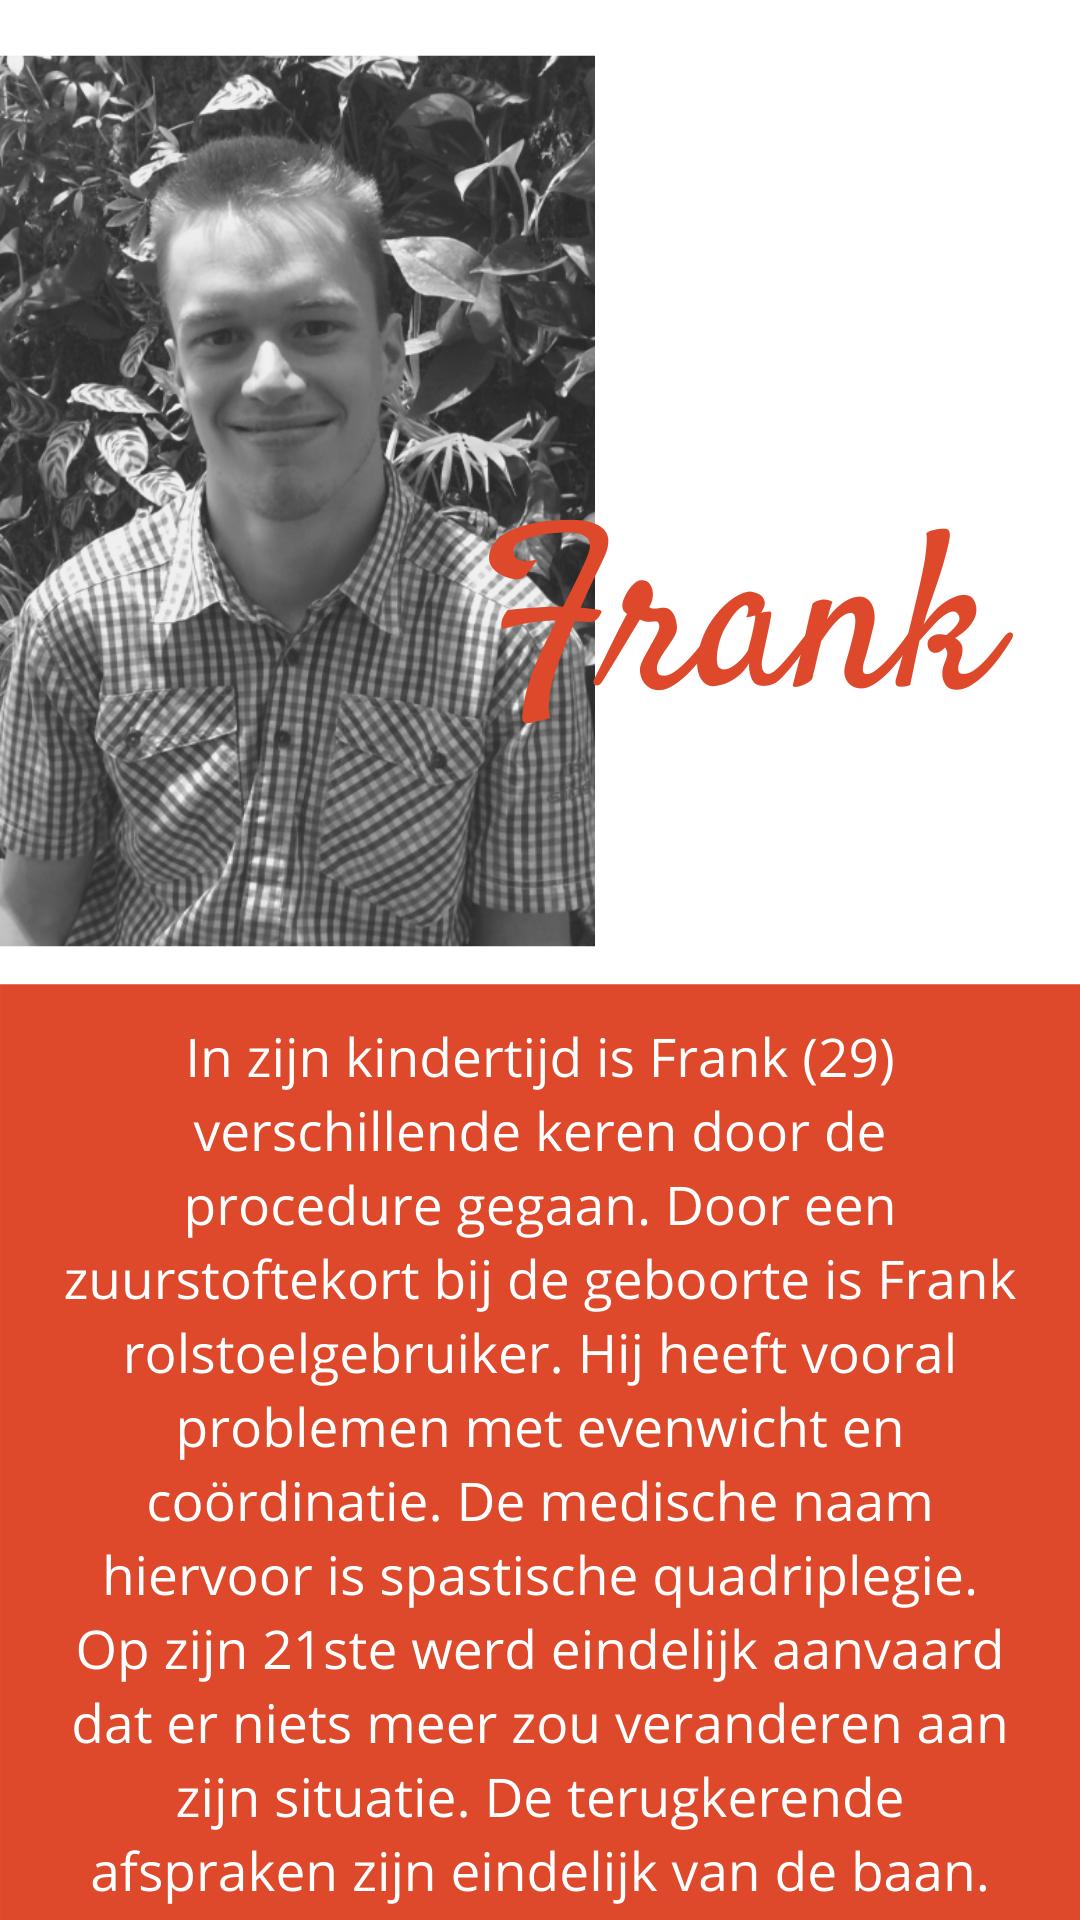 Frank Sioen